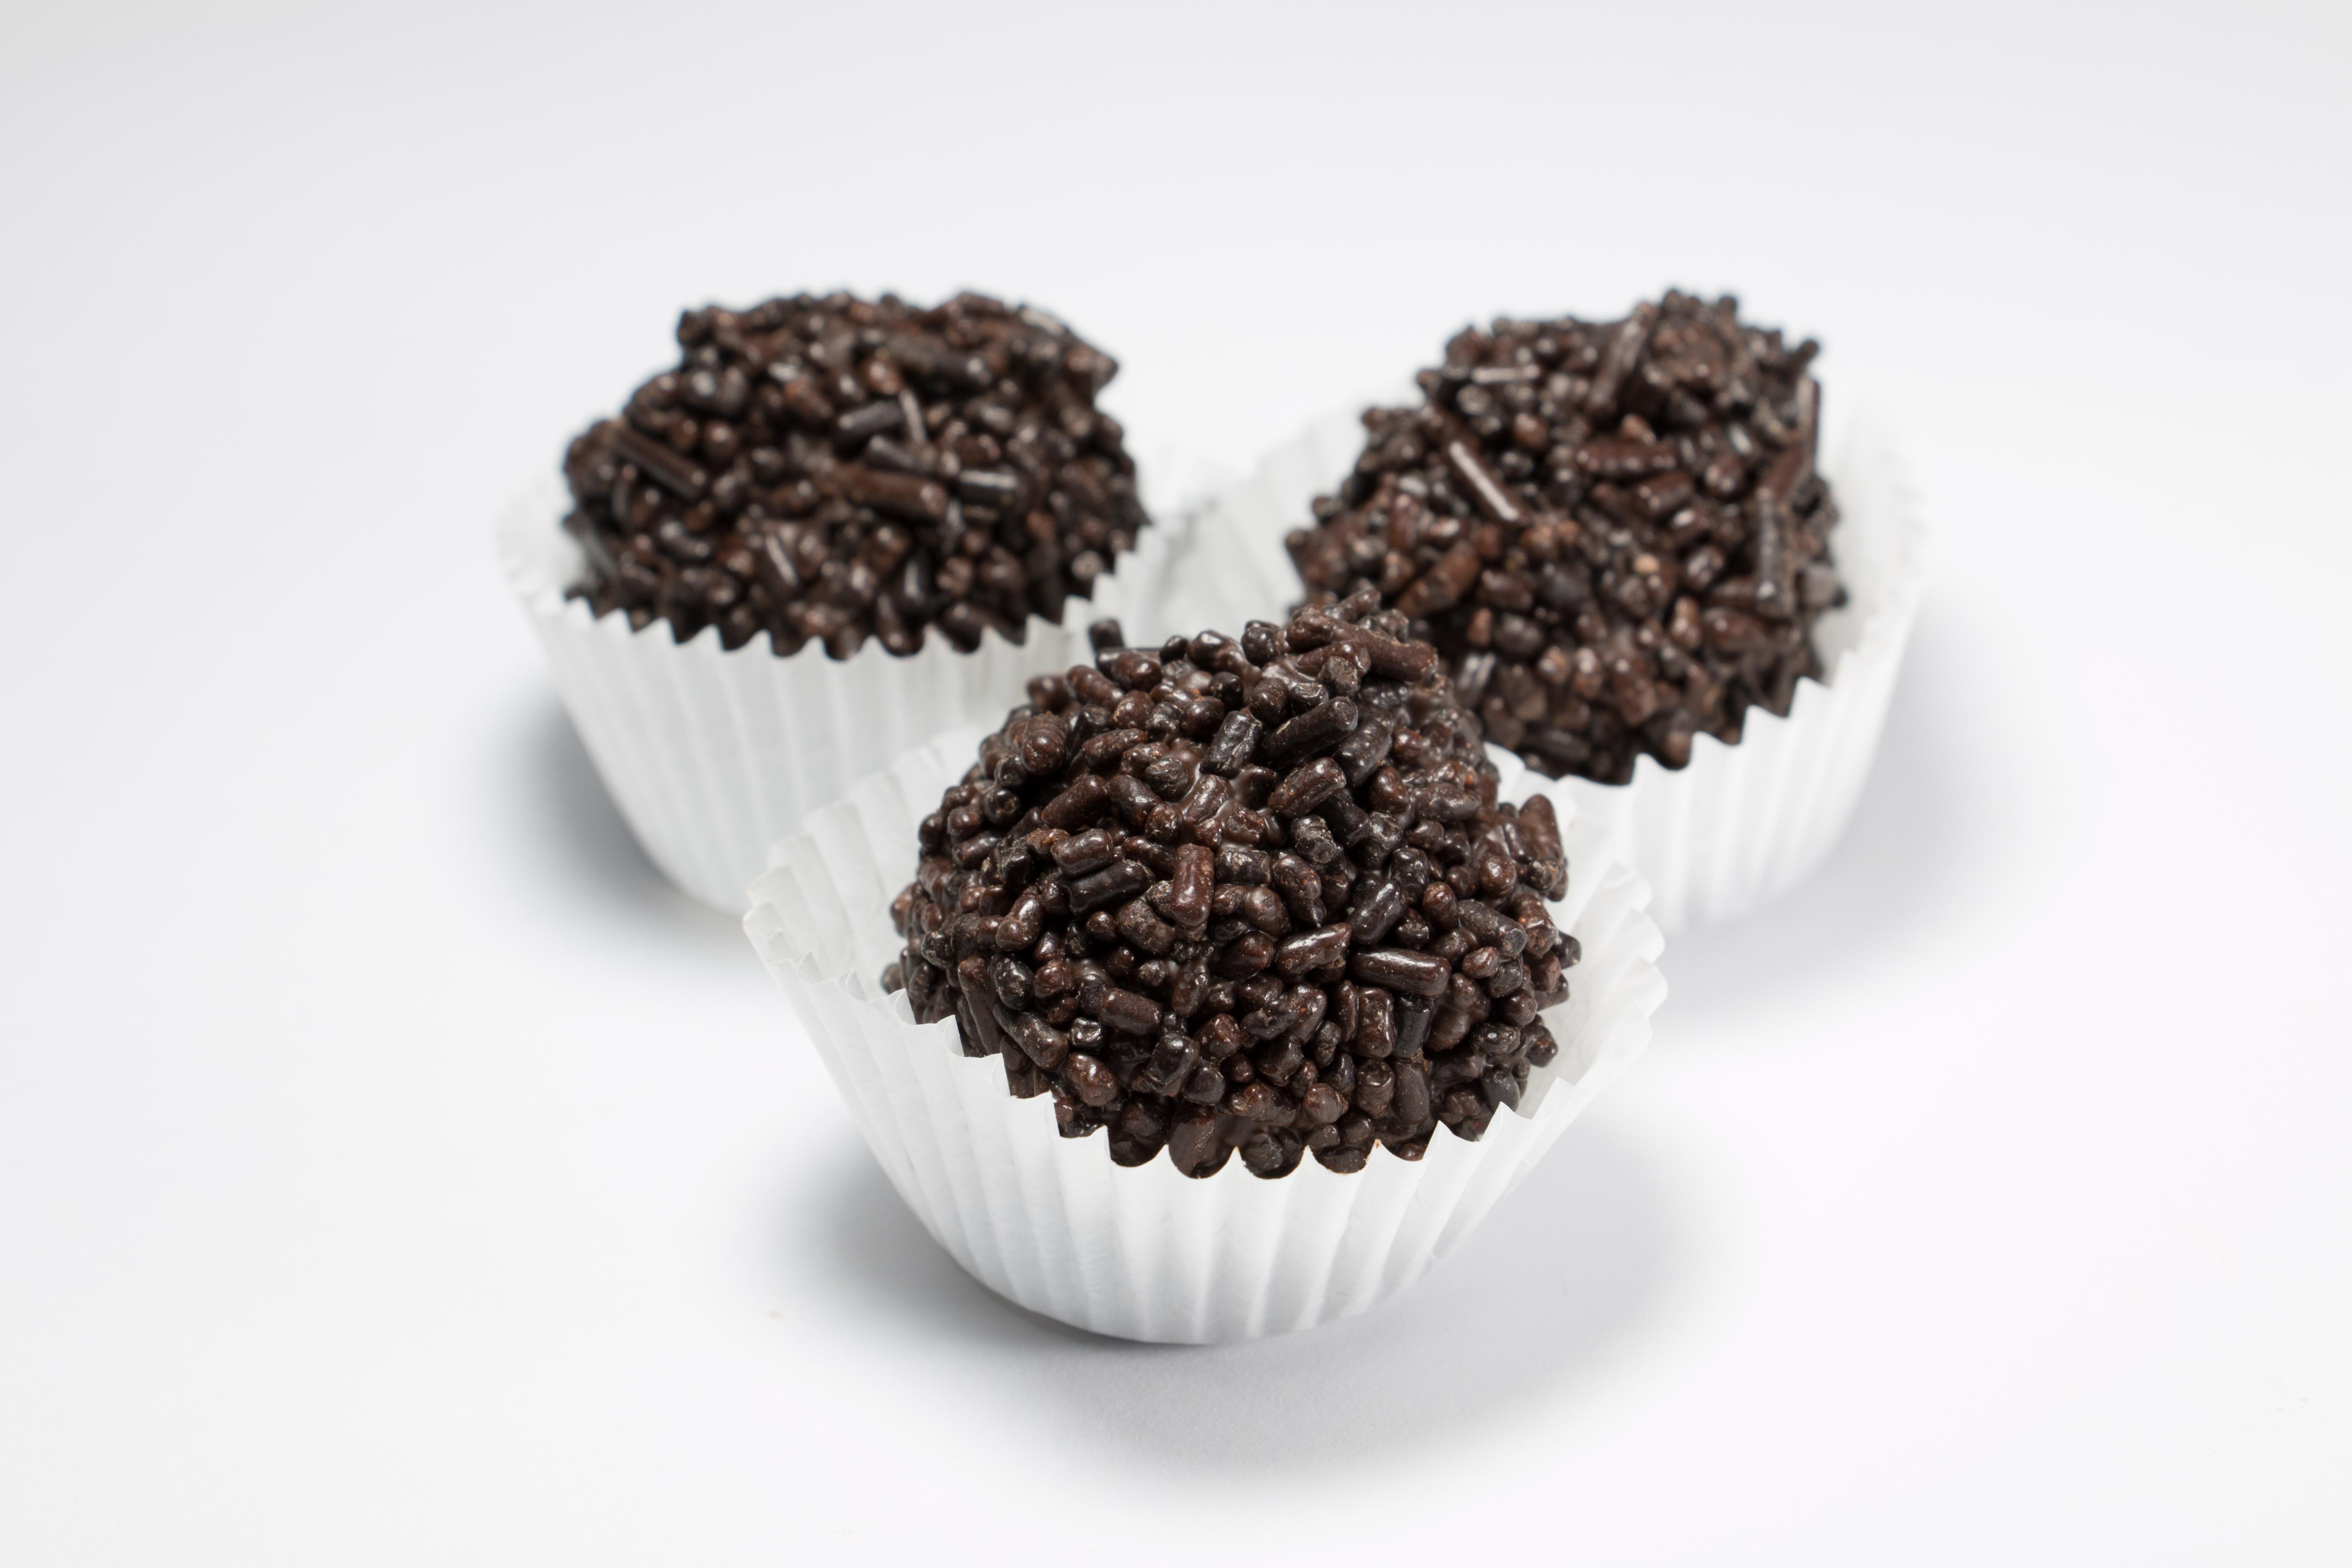 Fudge With Chocolate Sprinkles